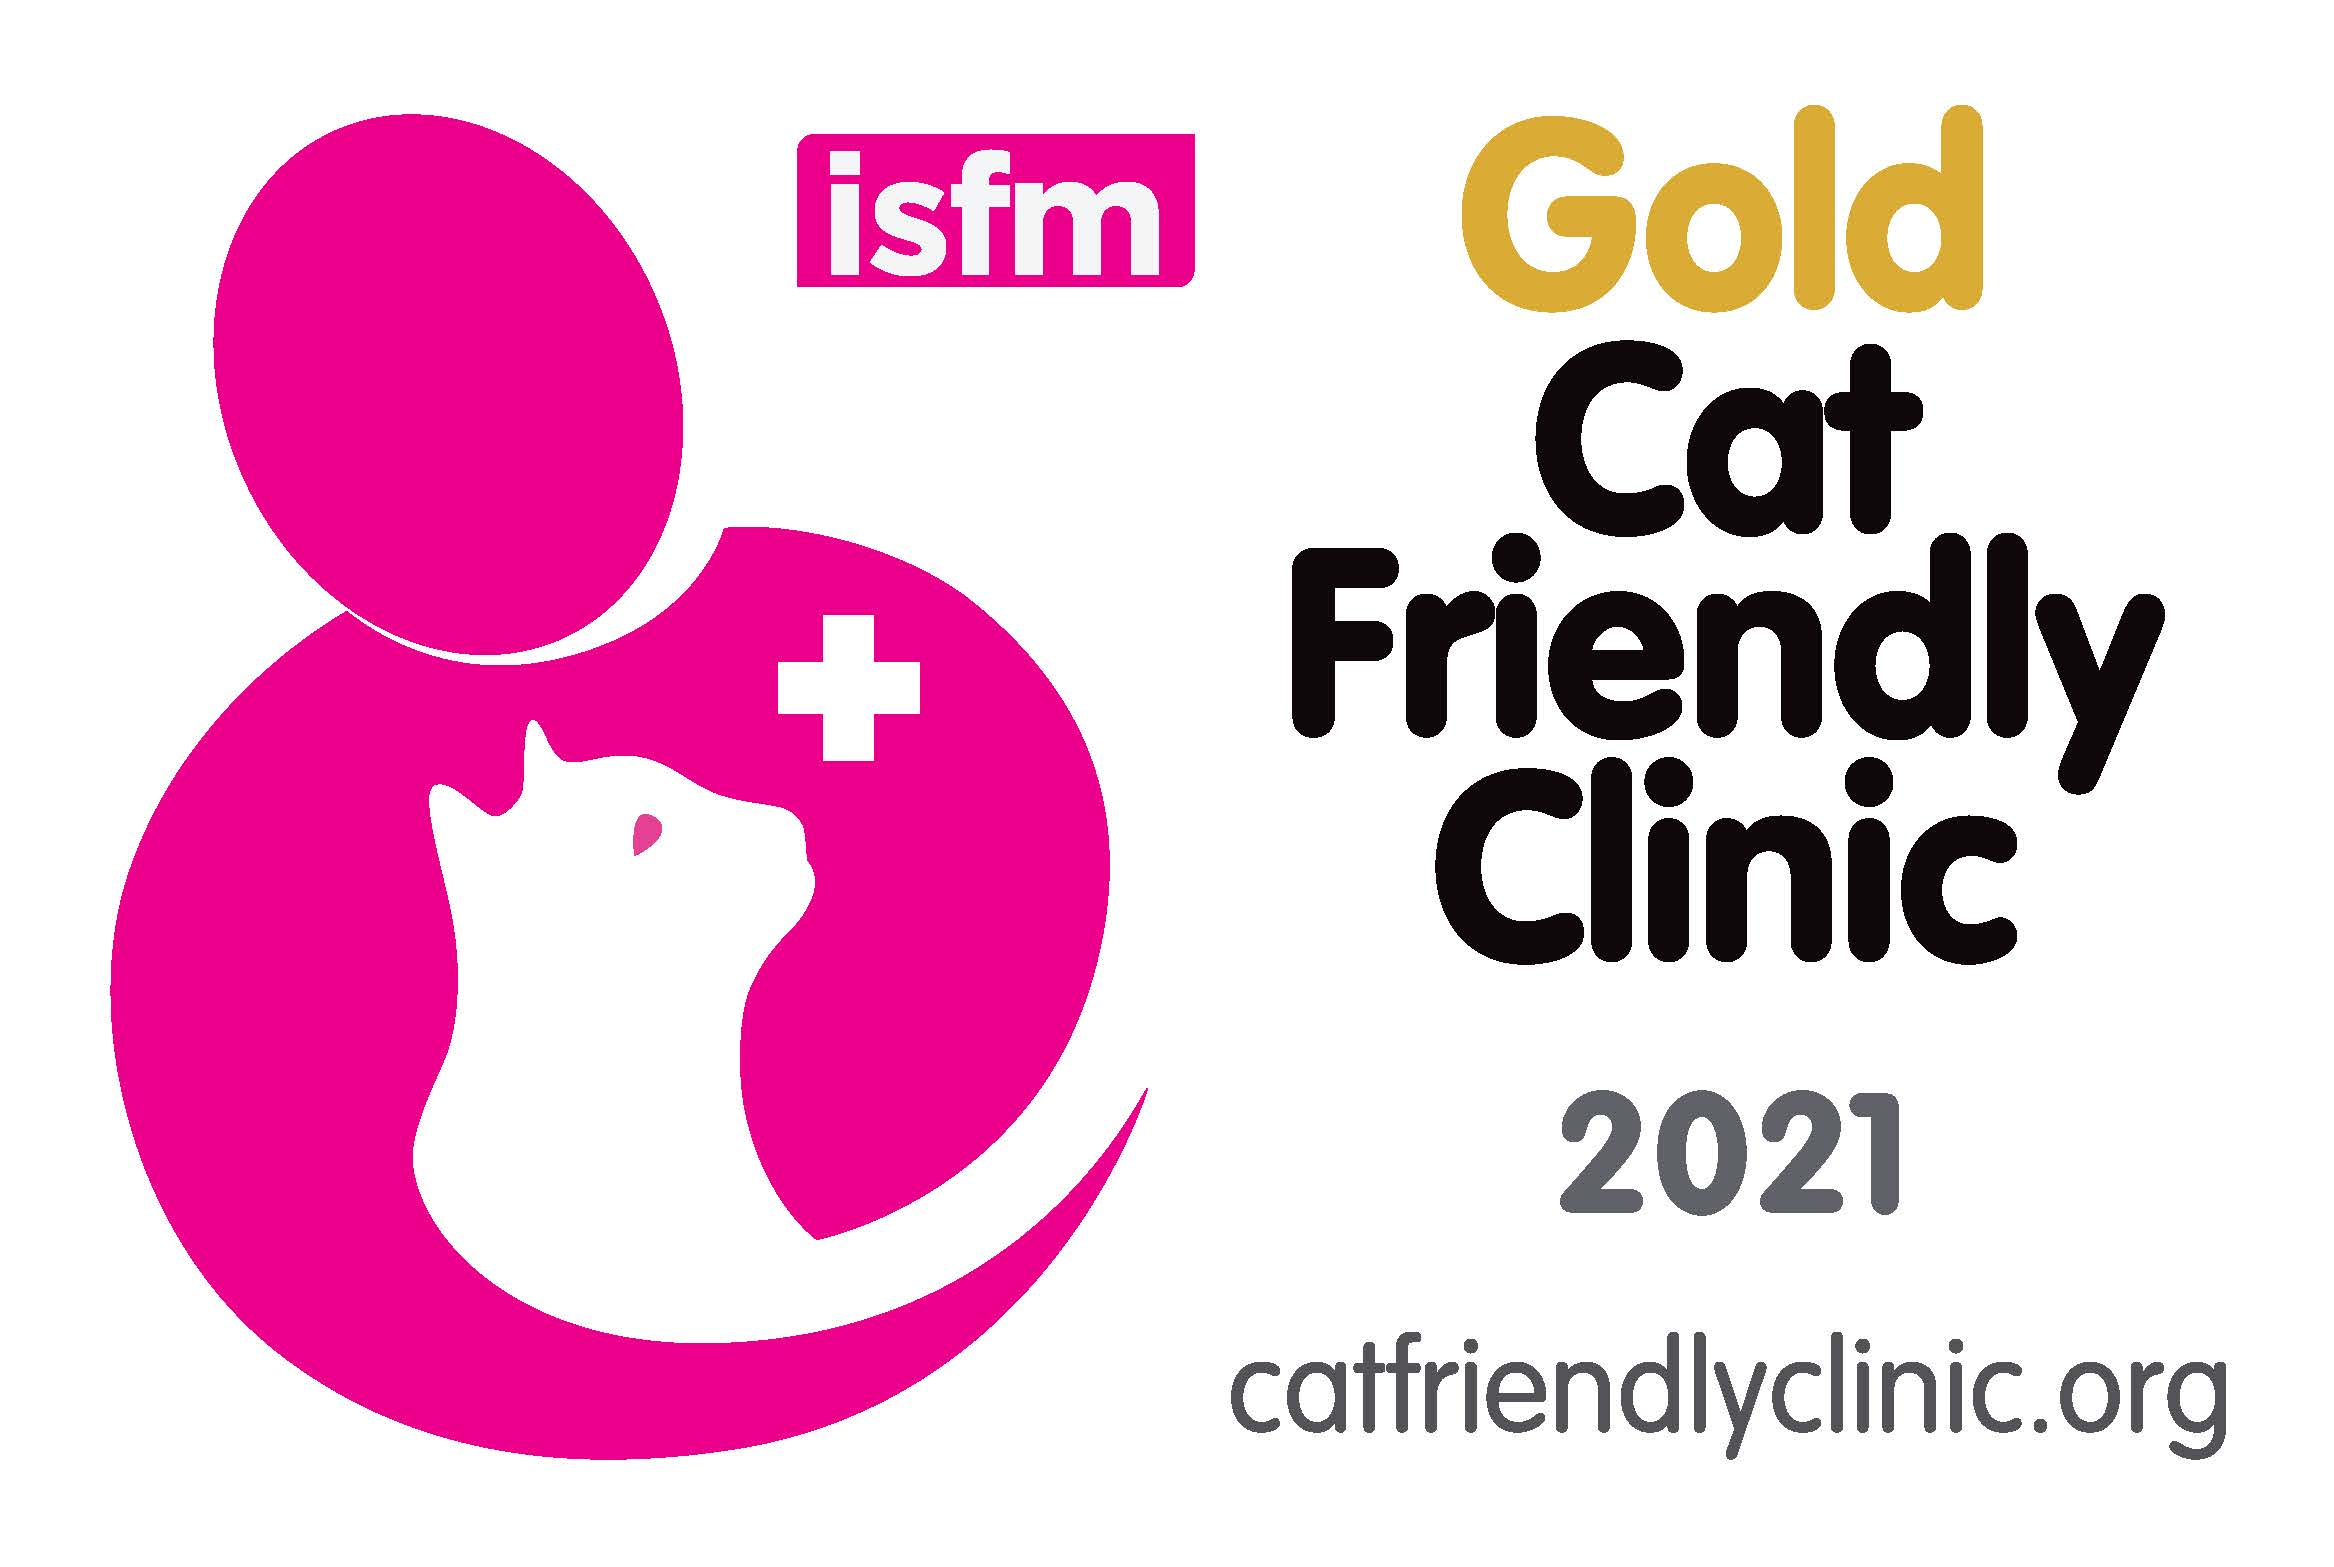 Cat Friendly Clinic Logo 2021